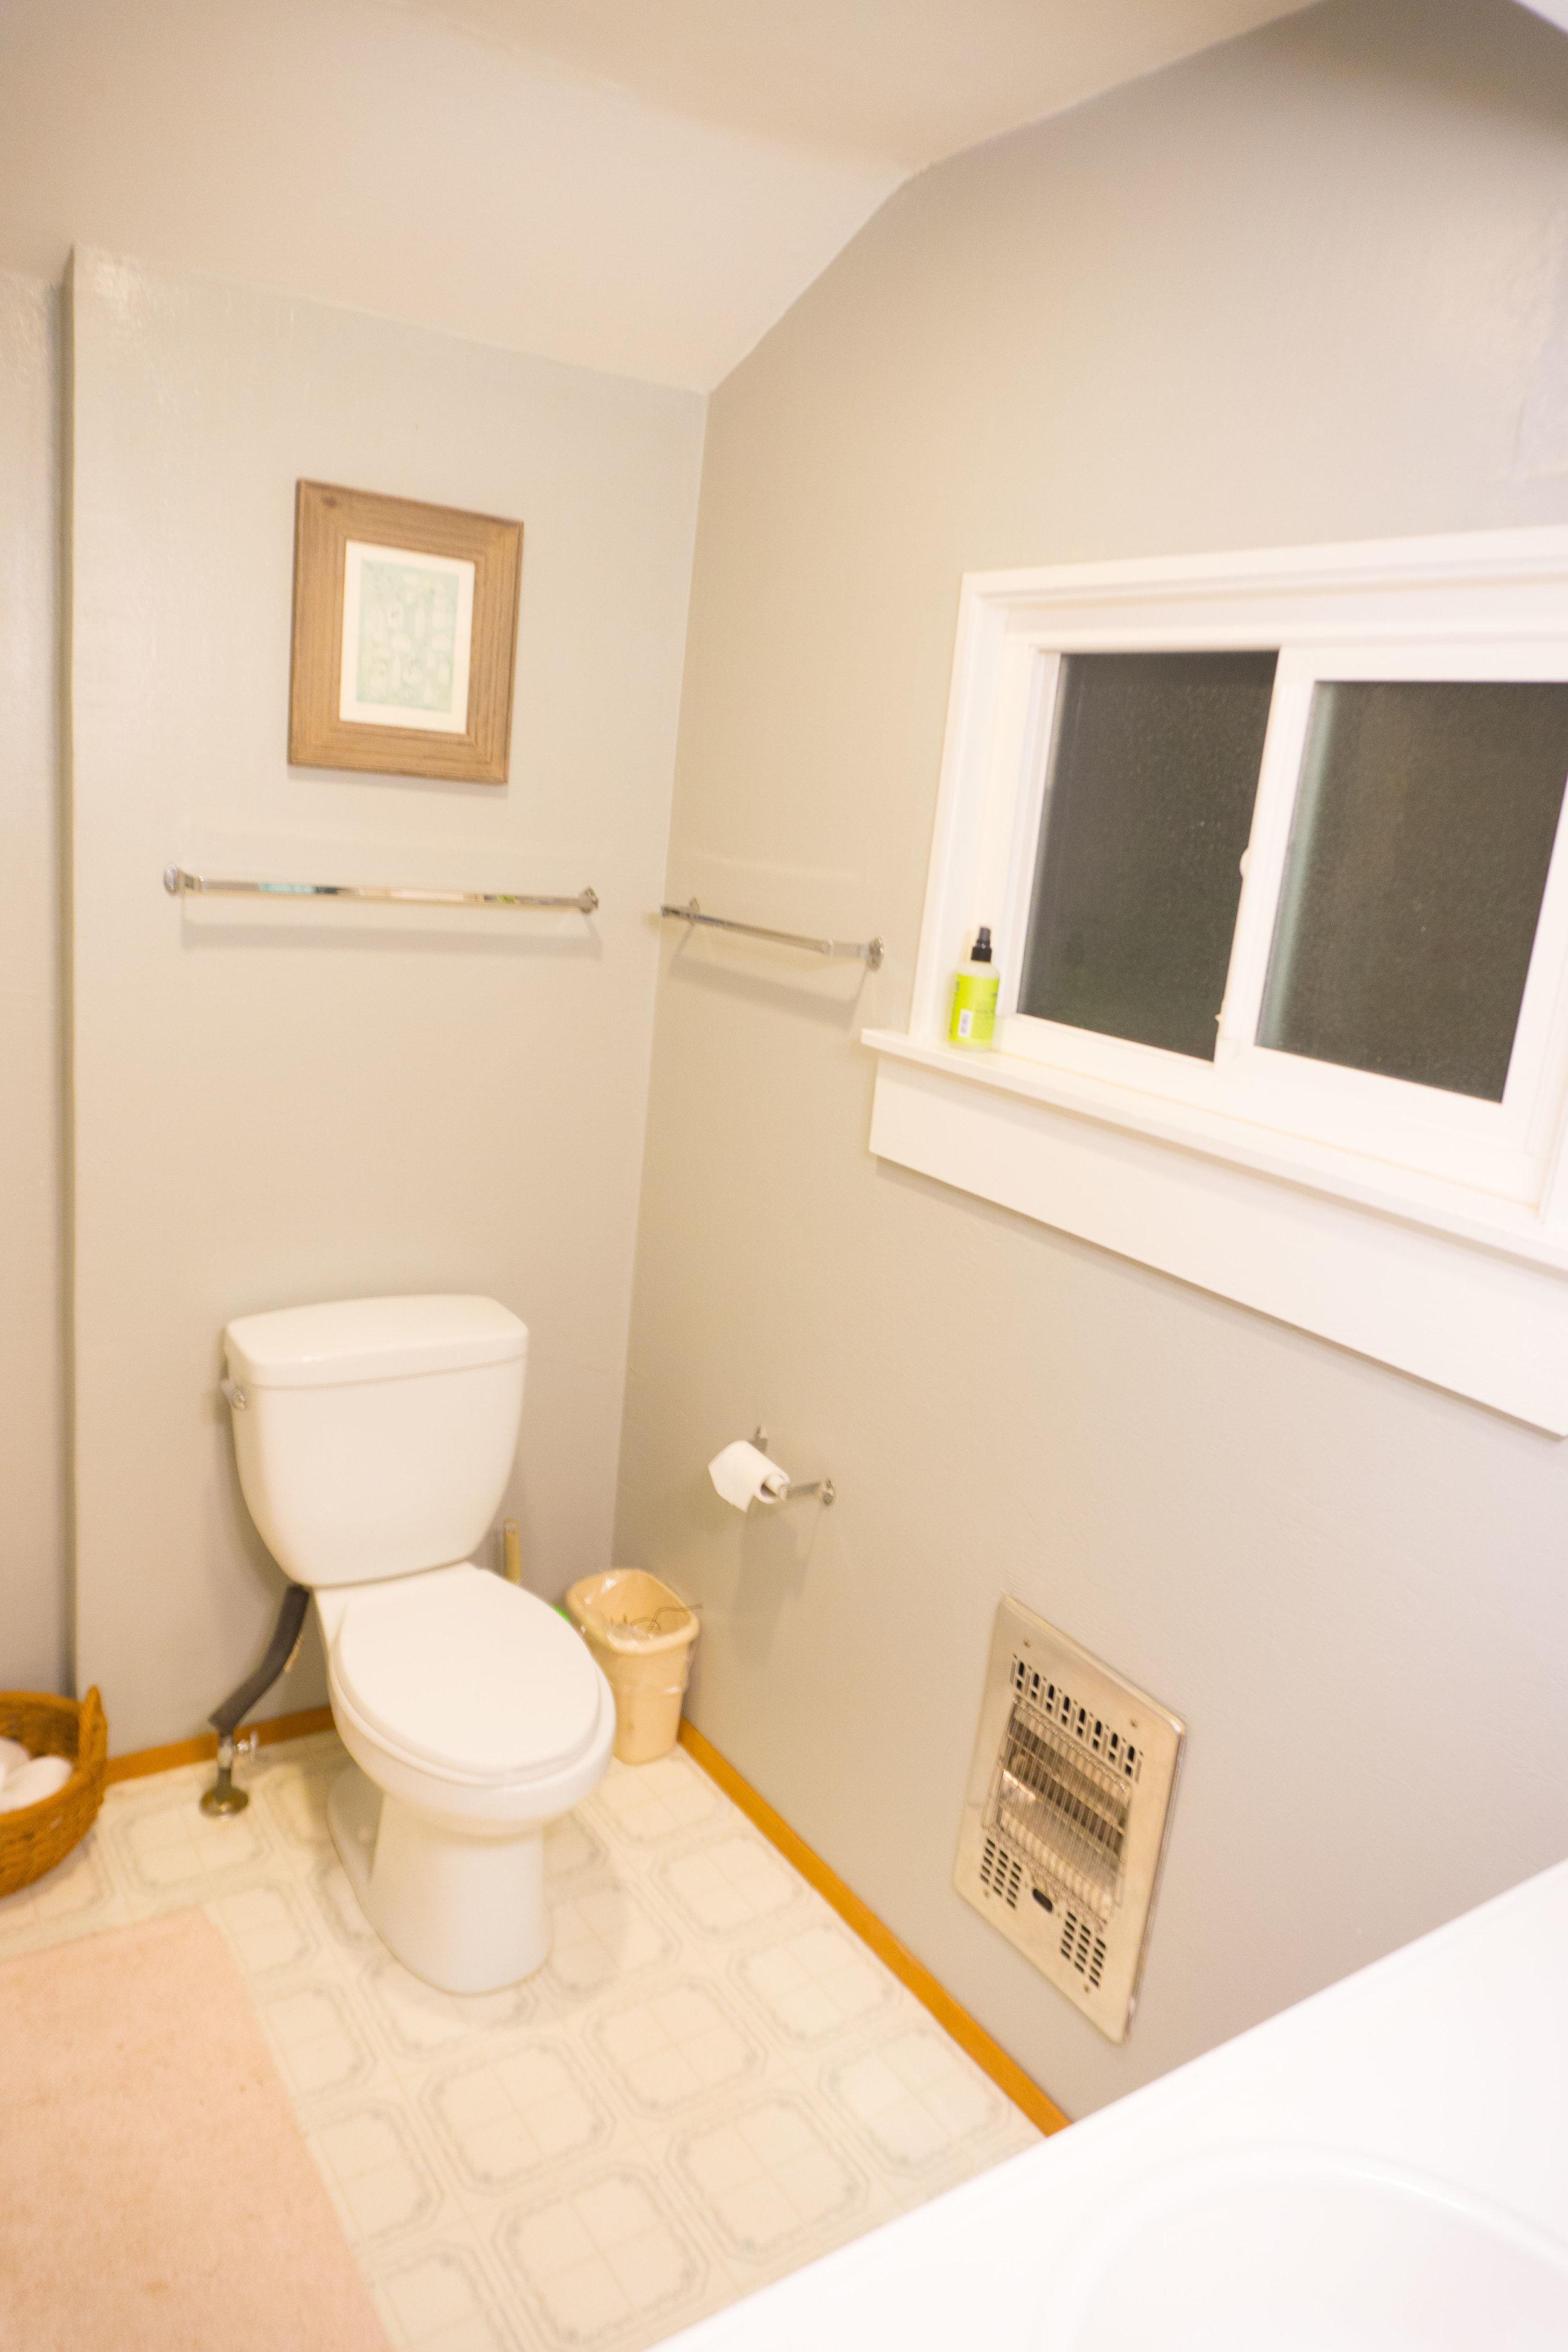 AirbnbHouse-05765.jpg